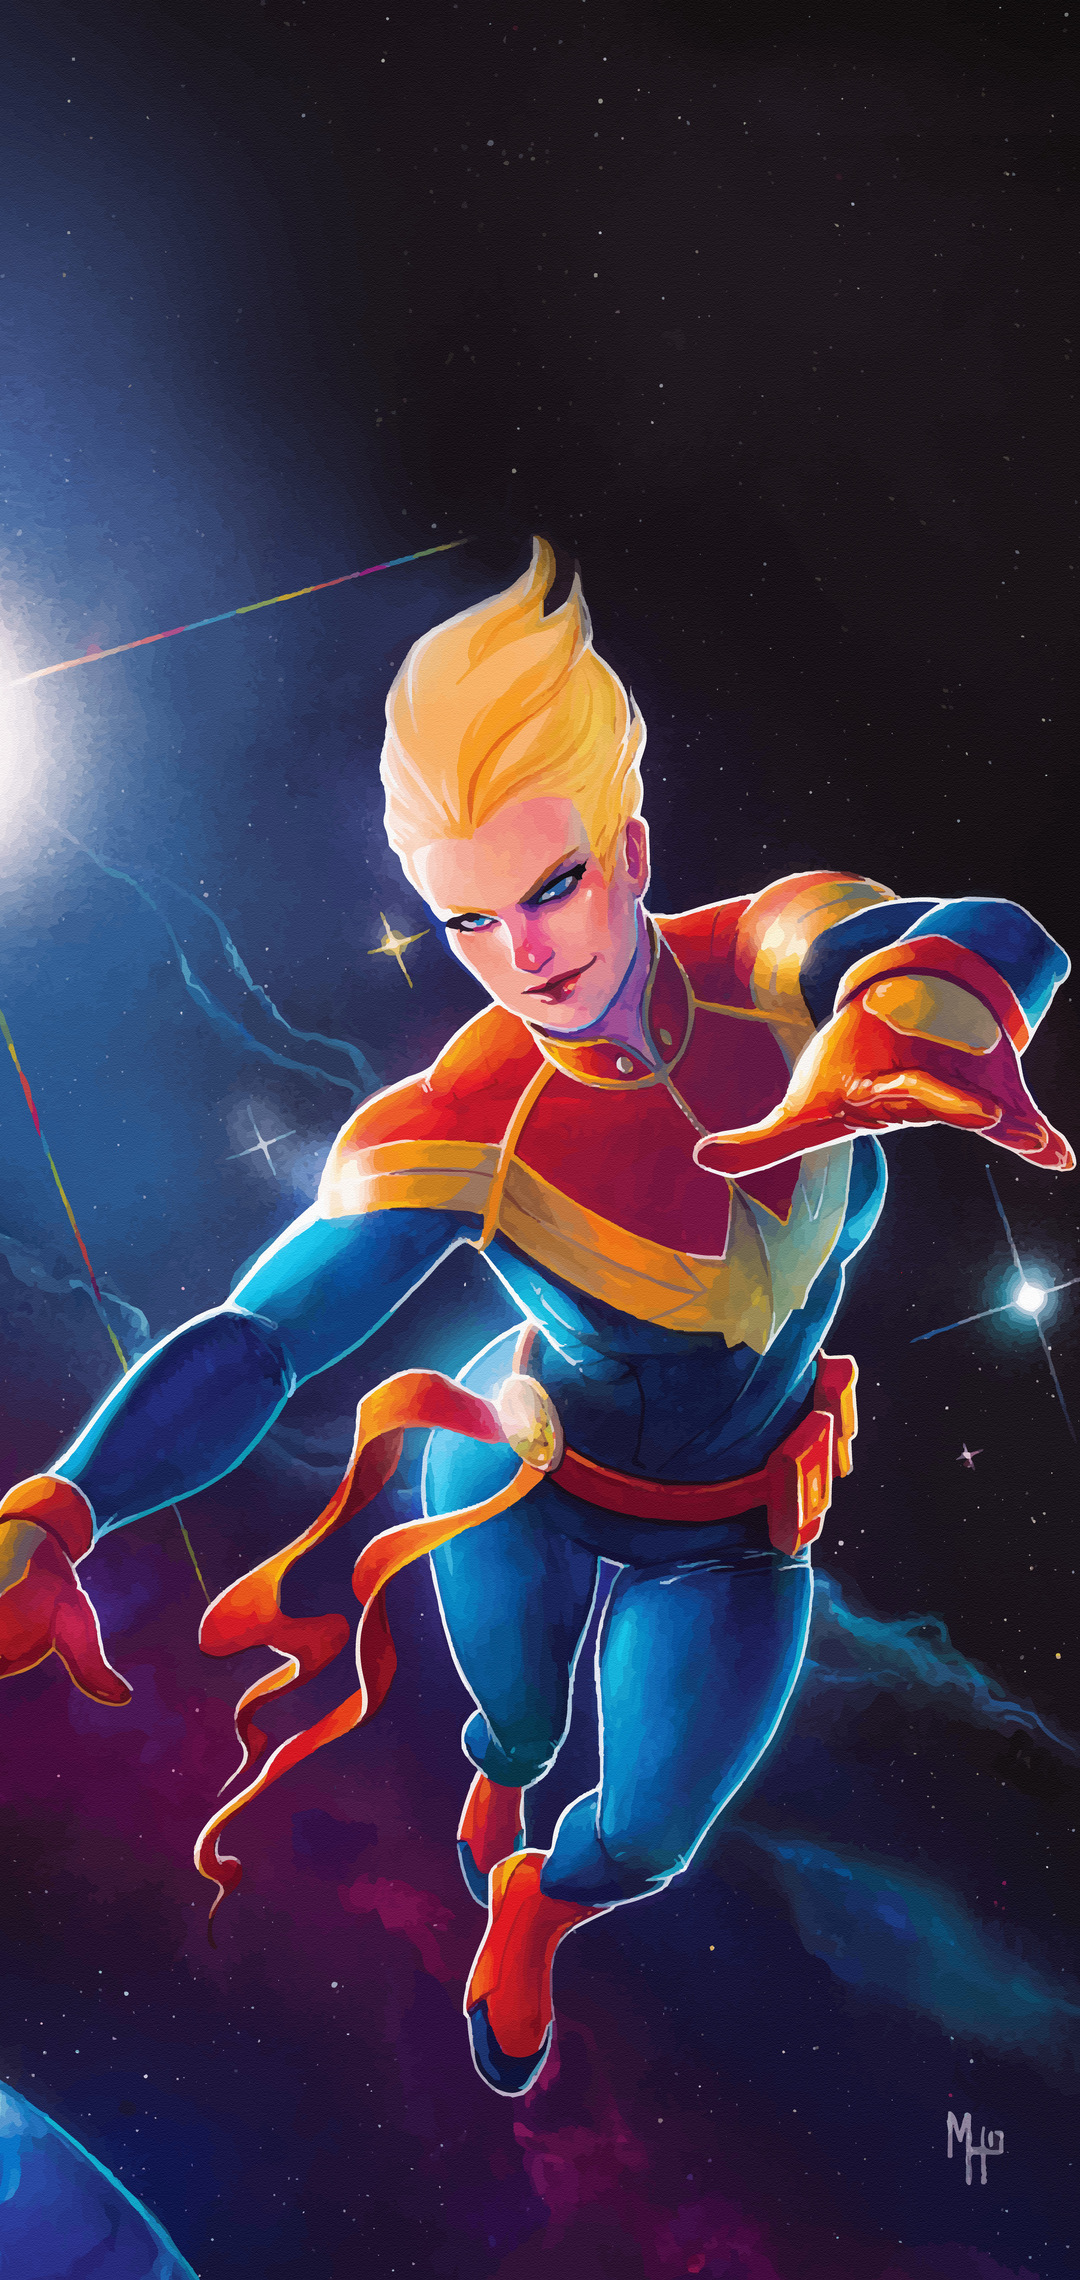 mighty-captain-marvel-4k-bi.jpg